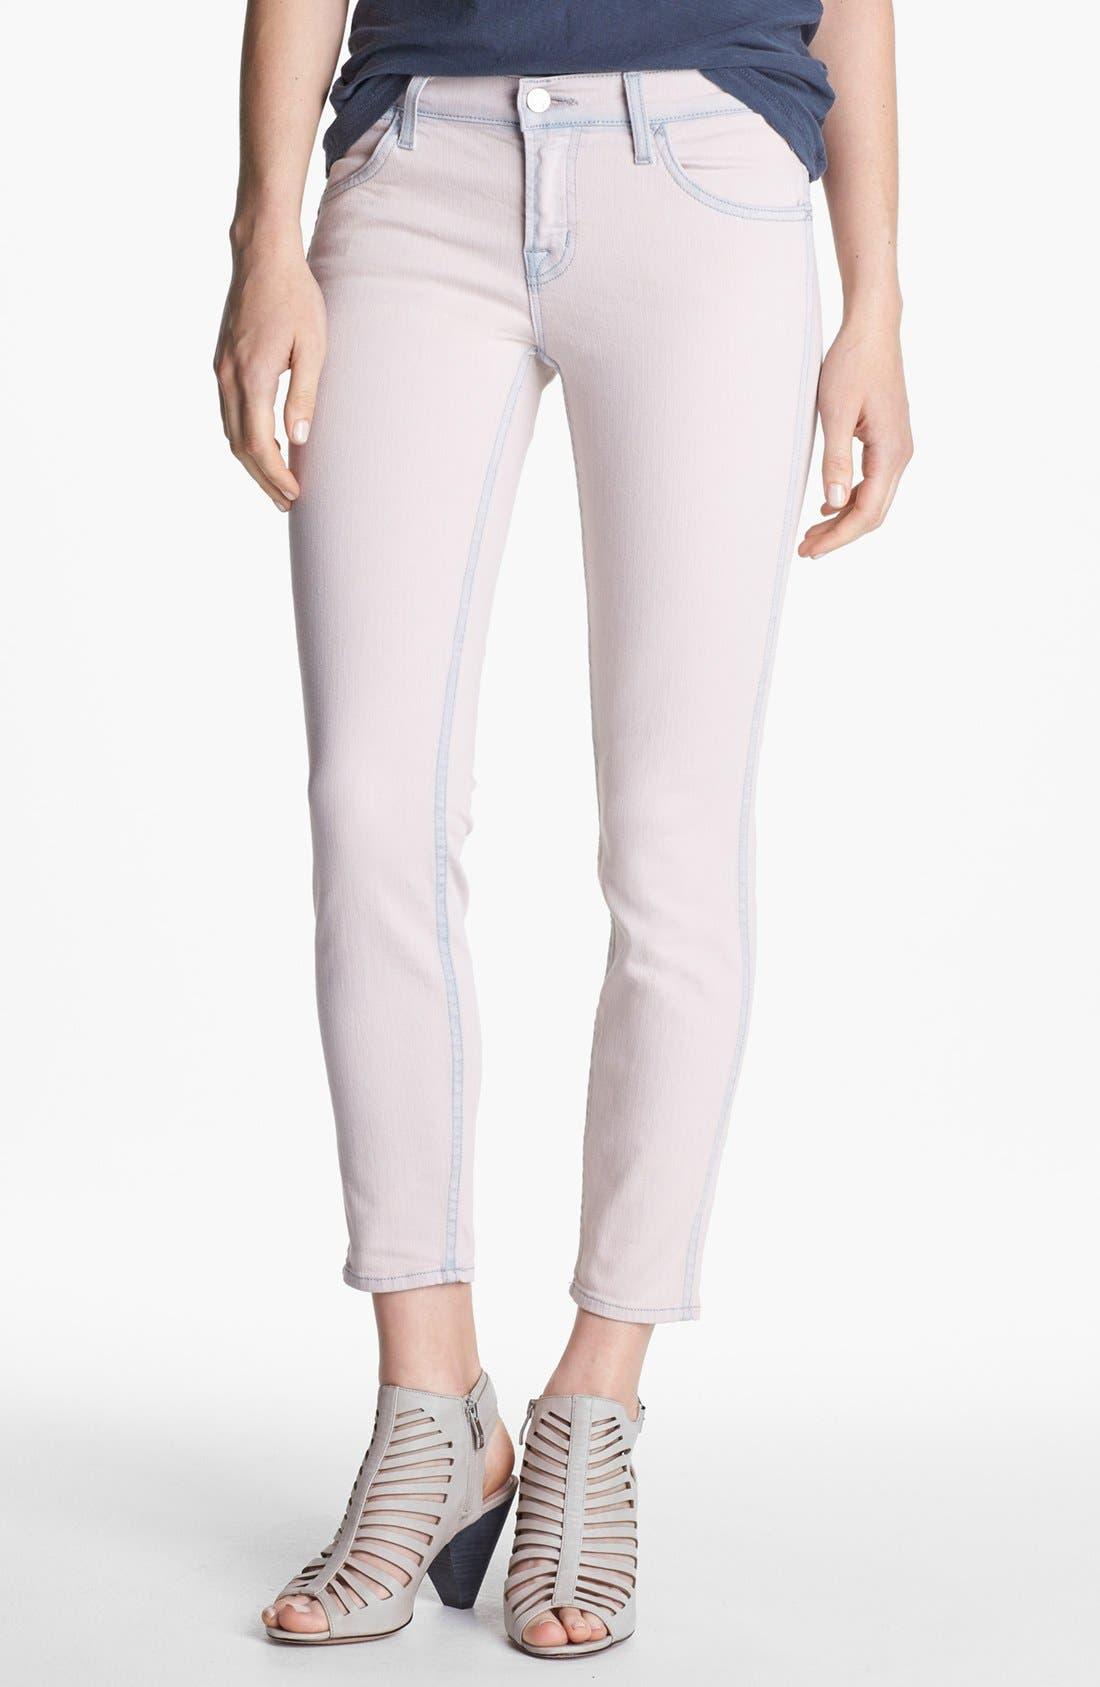 Alternate Image 1 Selected - J Brand 'Allegra' Ankle Skinny Jeans (Nirvana Magnolia)